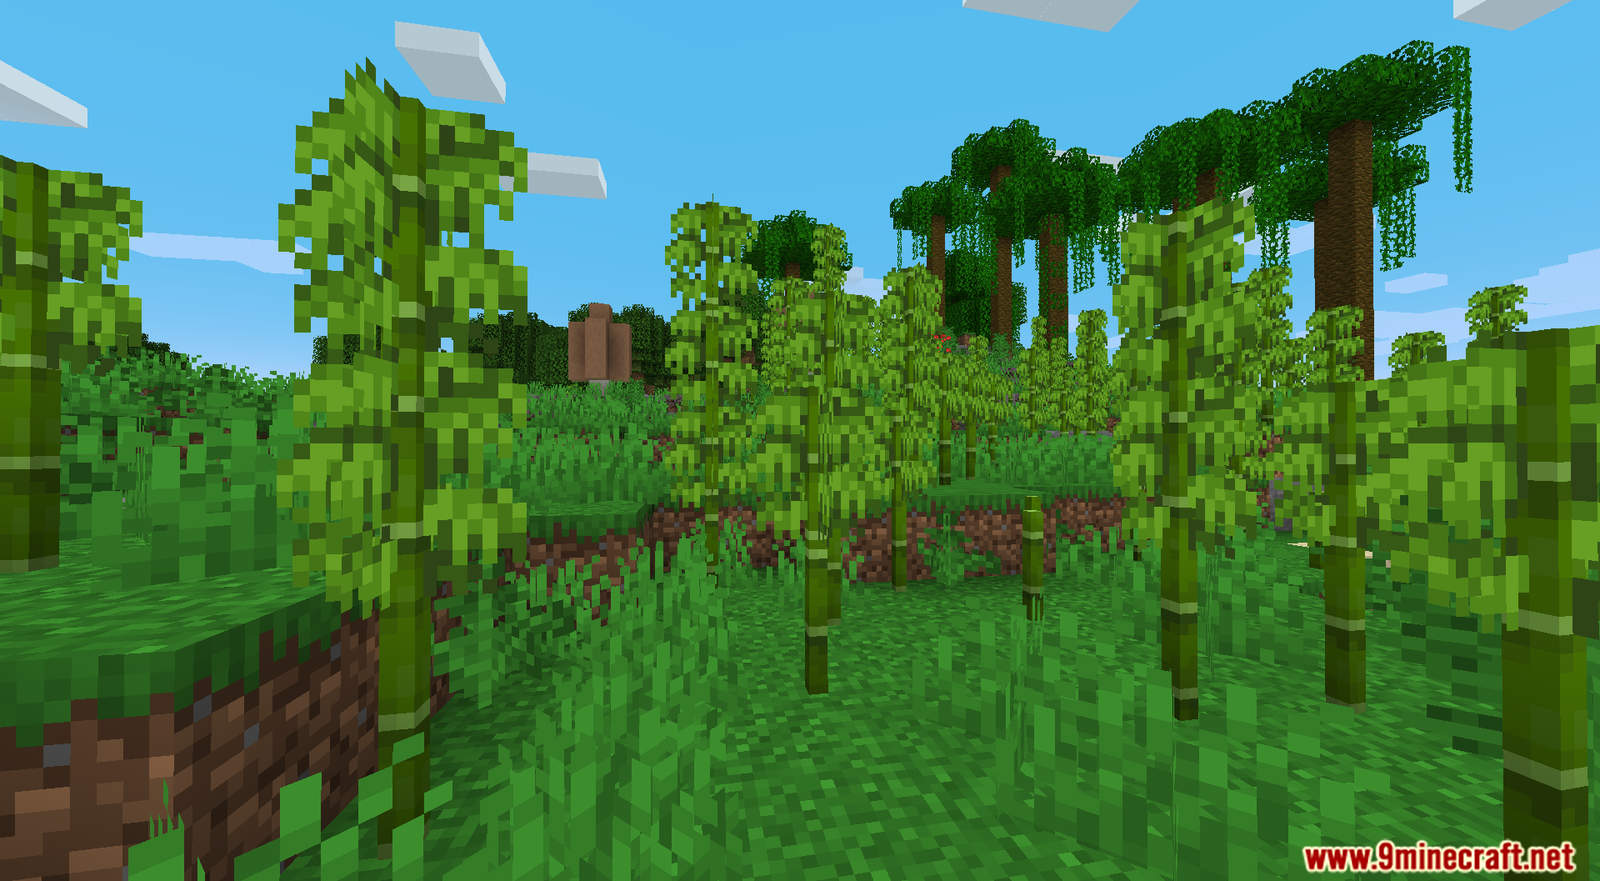 William Wythers' Overhauled Overworld Mod for Minecraft (11)